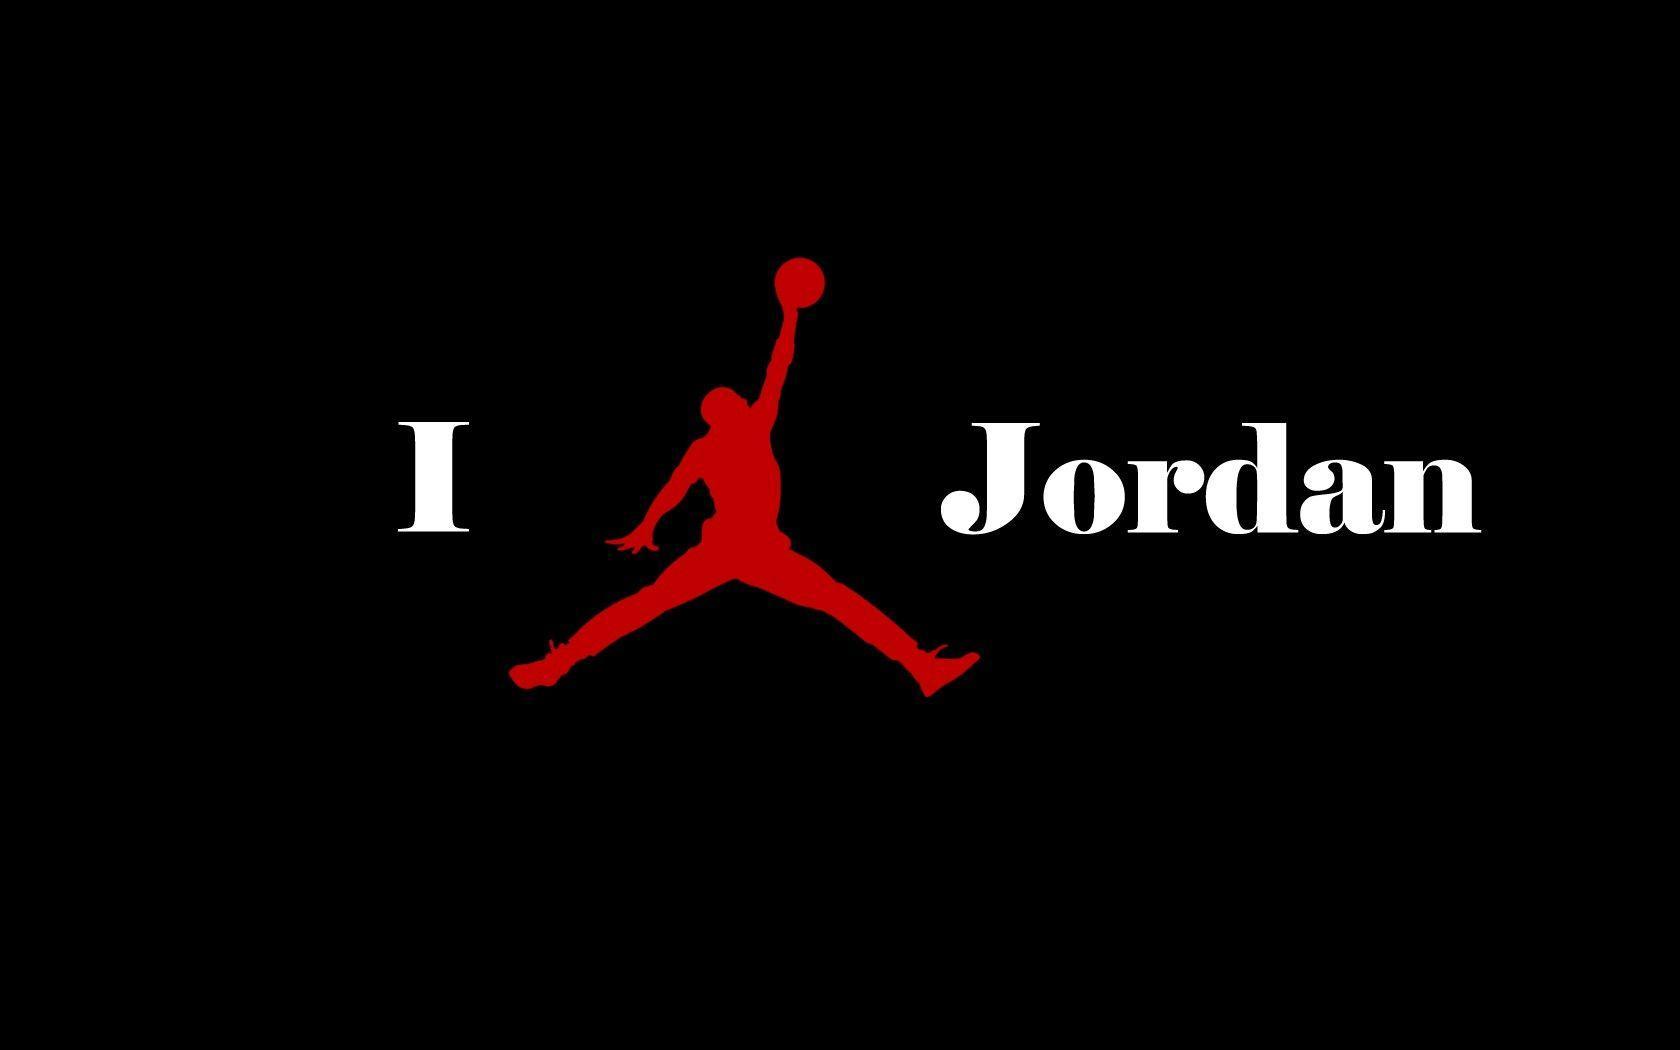 official photos e2335 673cc 1680x1050 Michael Jordan Wallpapers Group (347+)